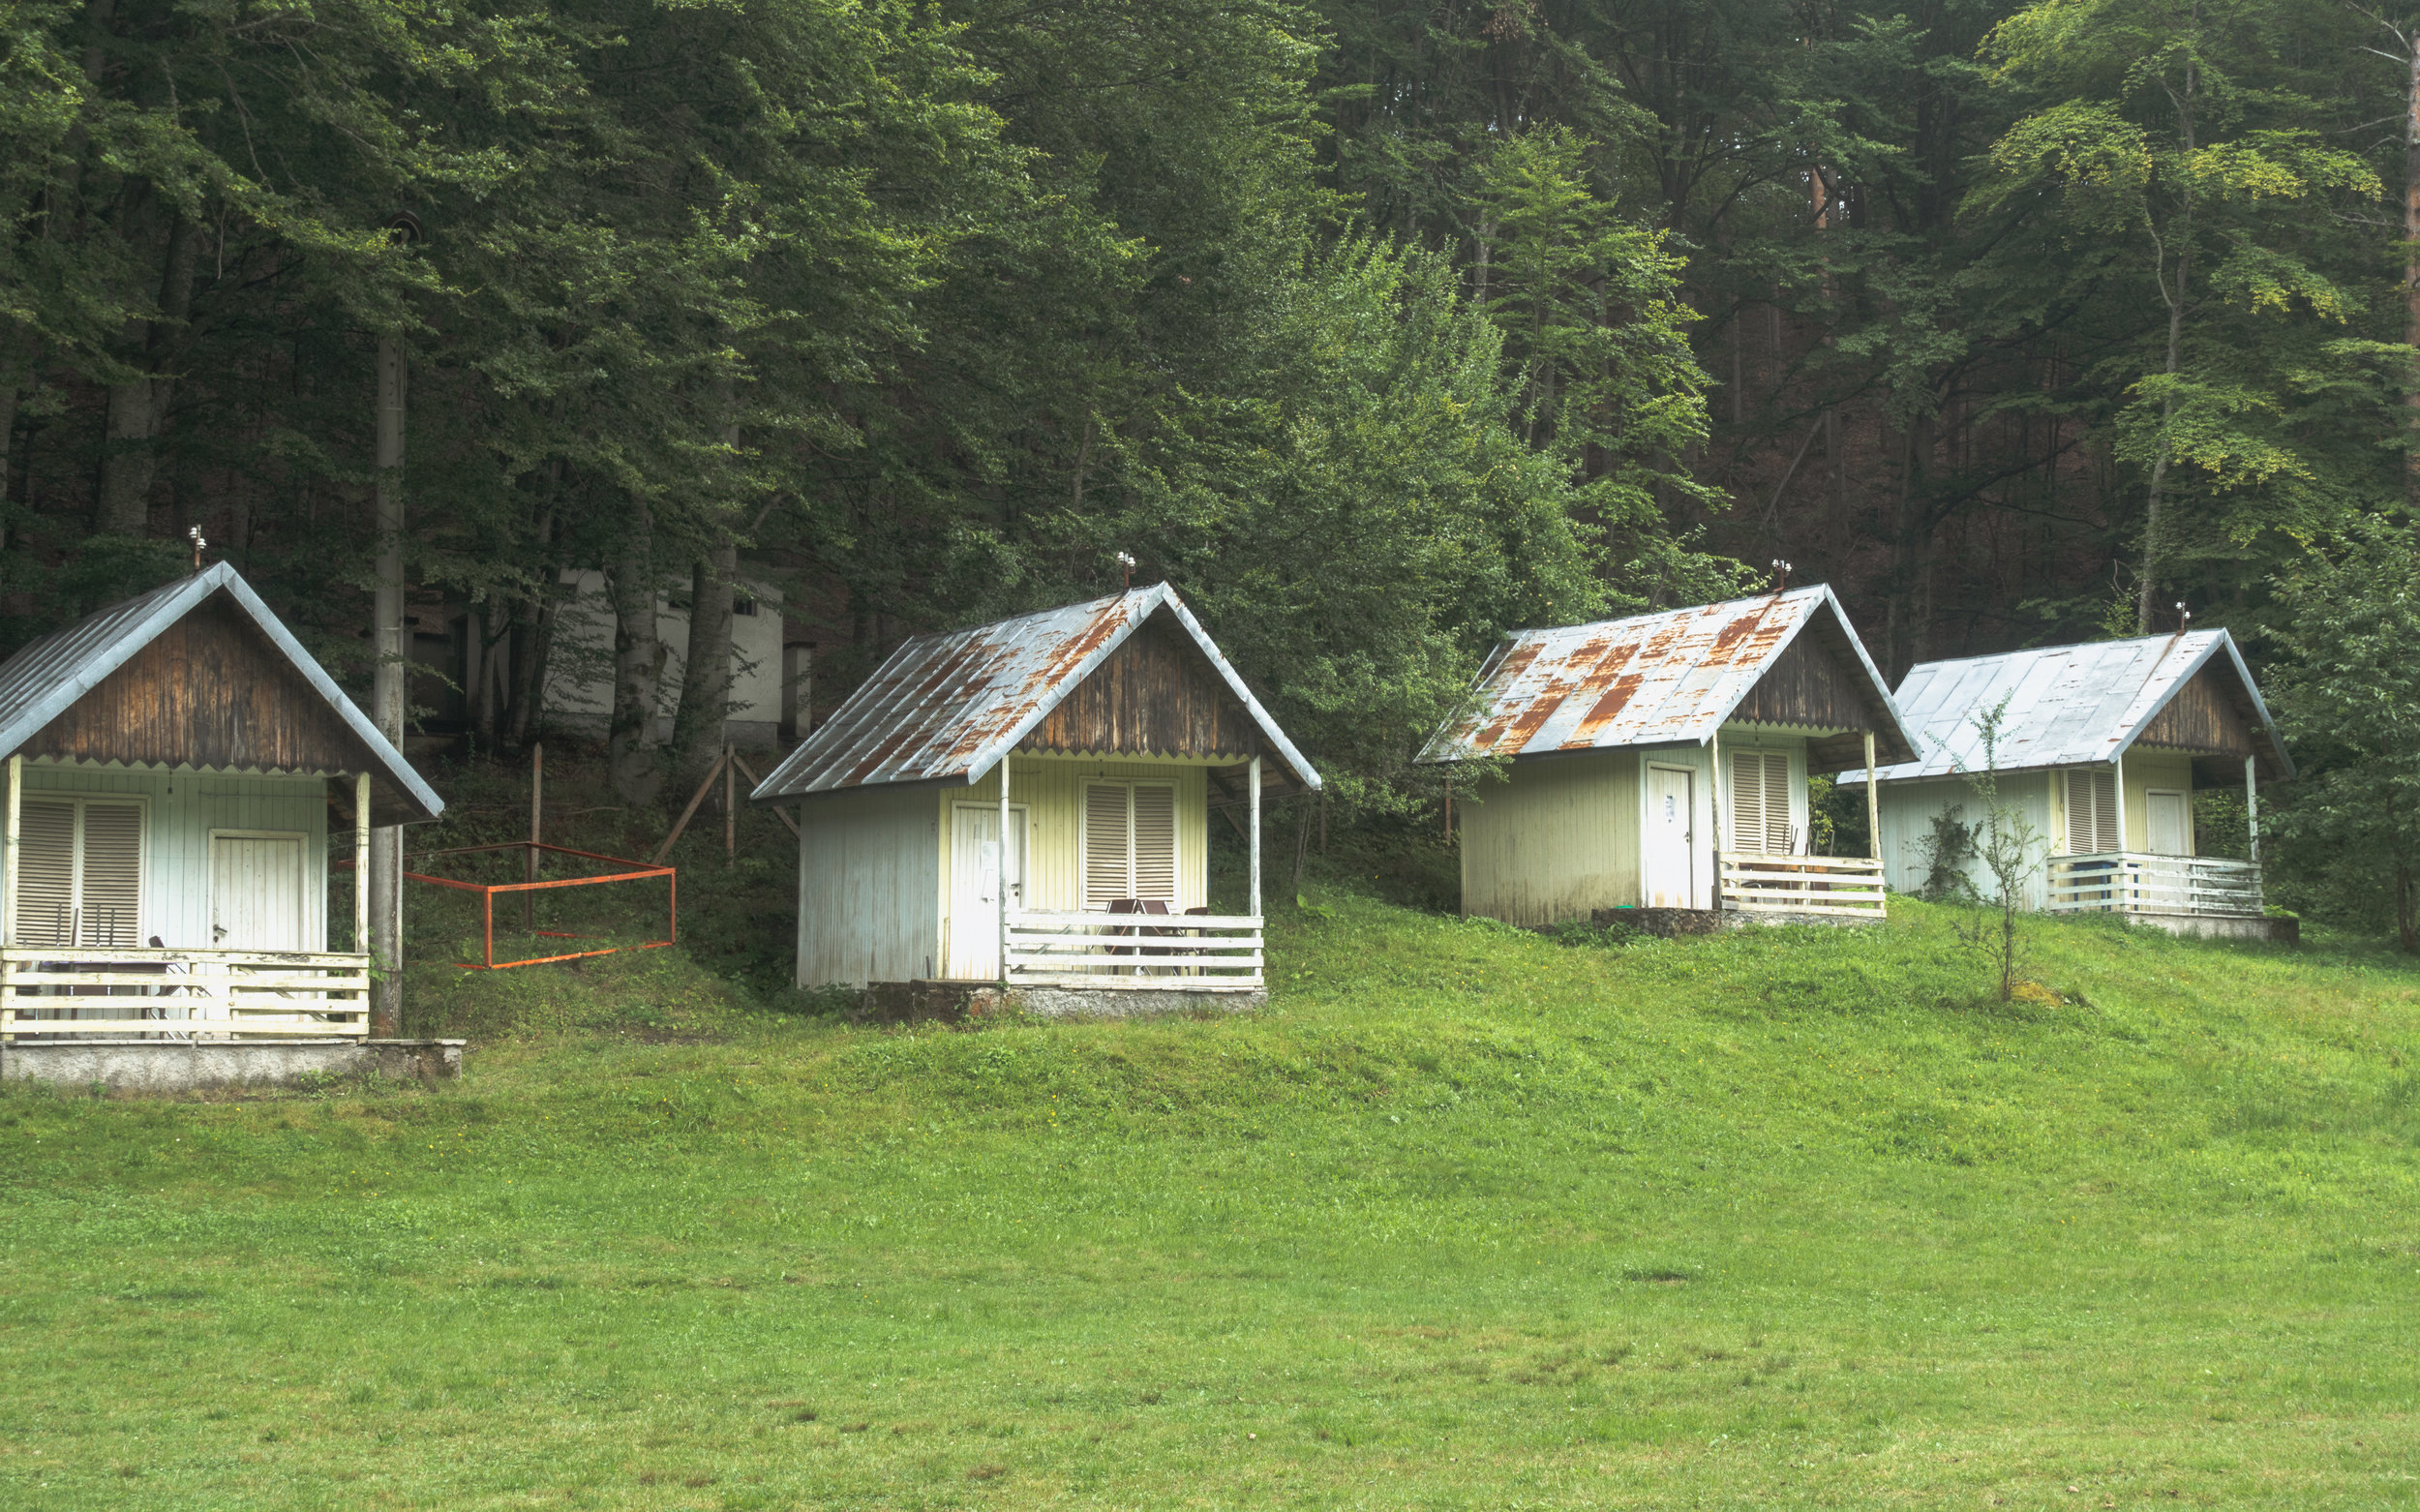 A former Communist campsite